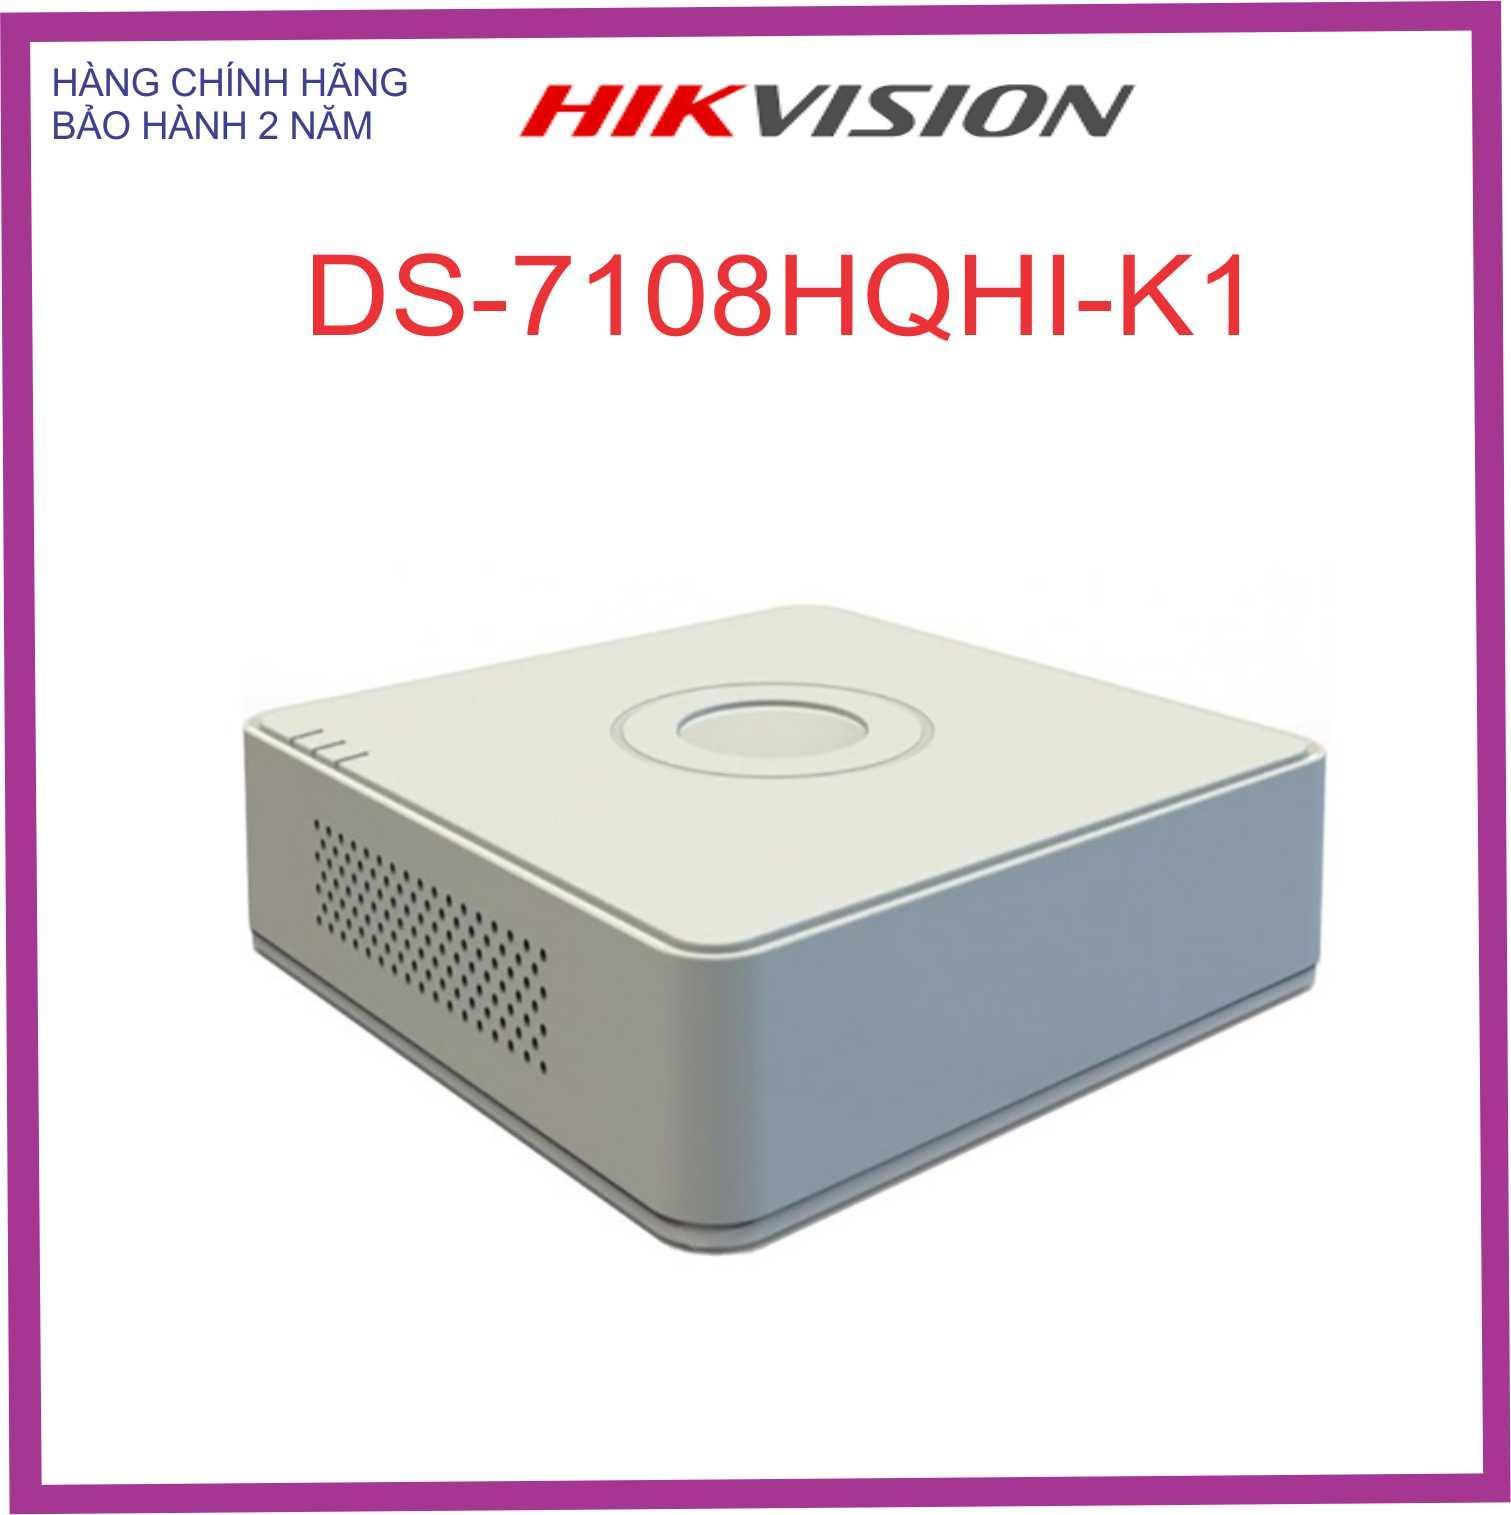 ĐẦU GHI HÌNH HIKVISION DS-7108HQHI-K1